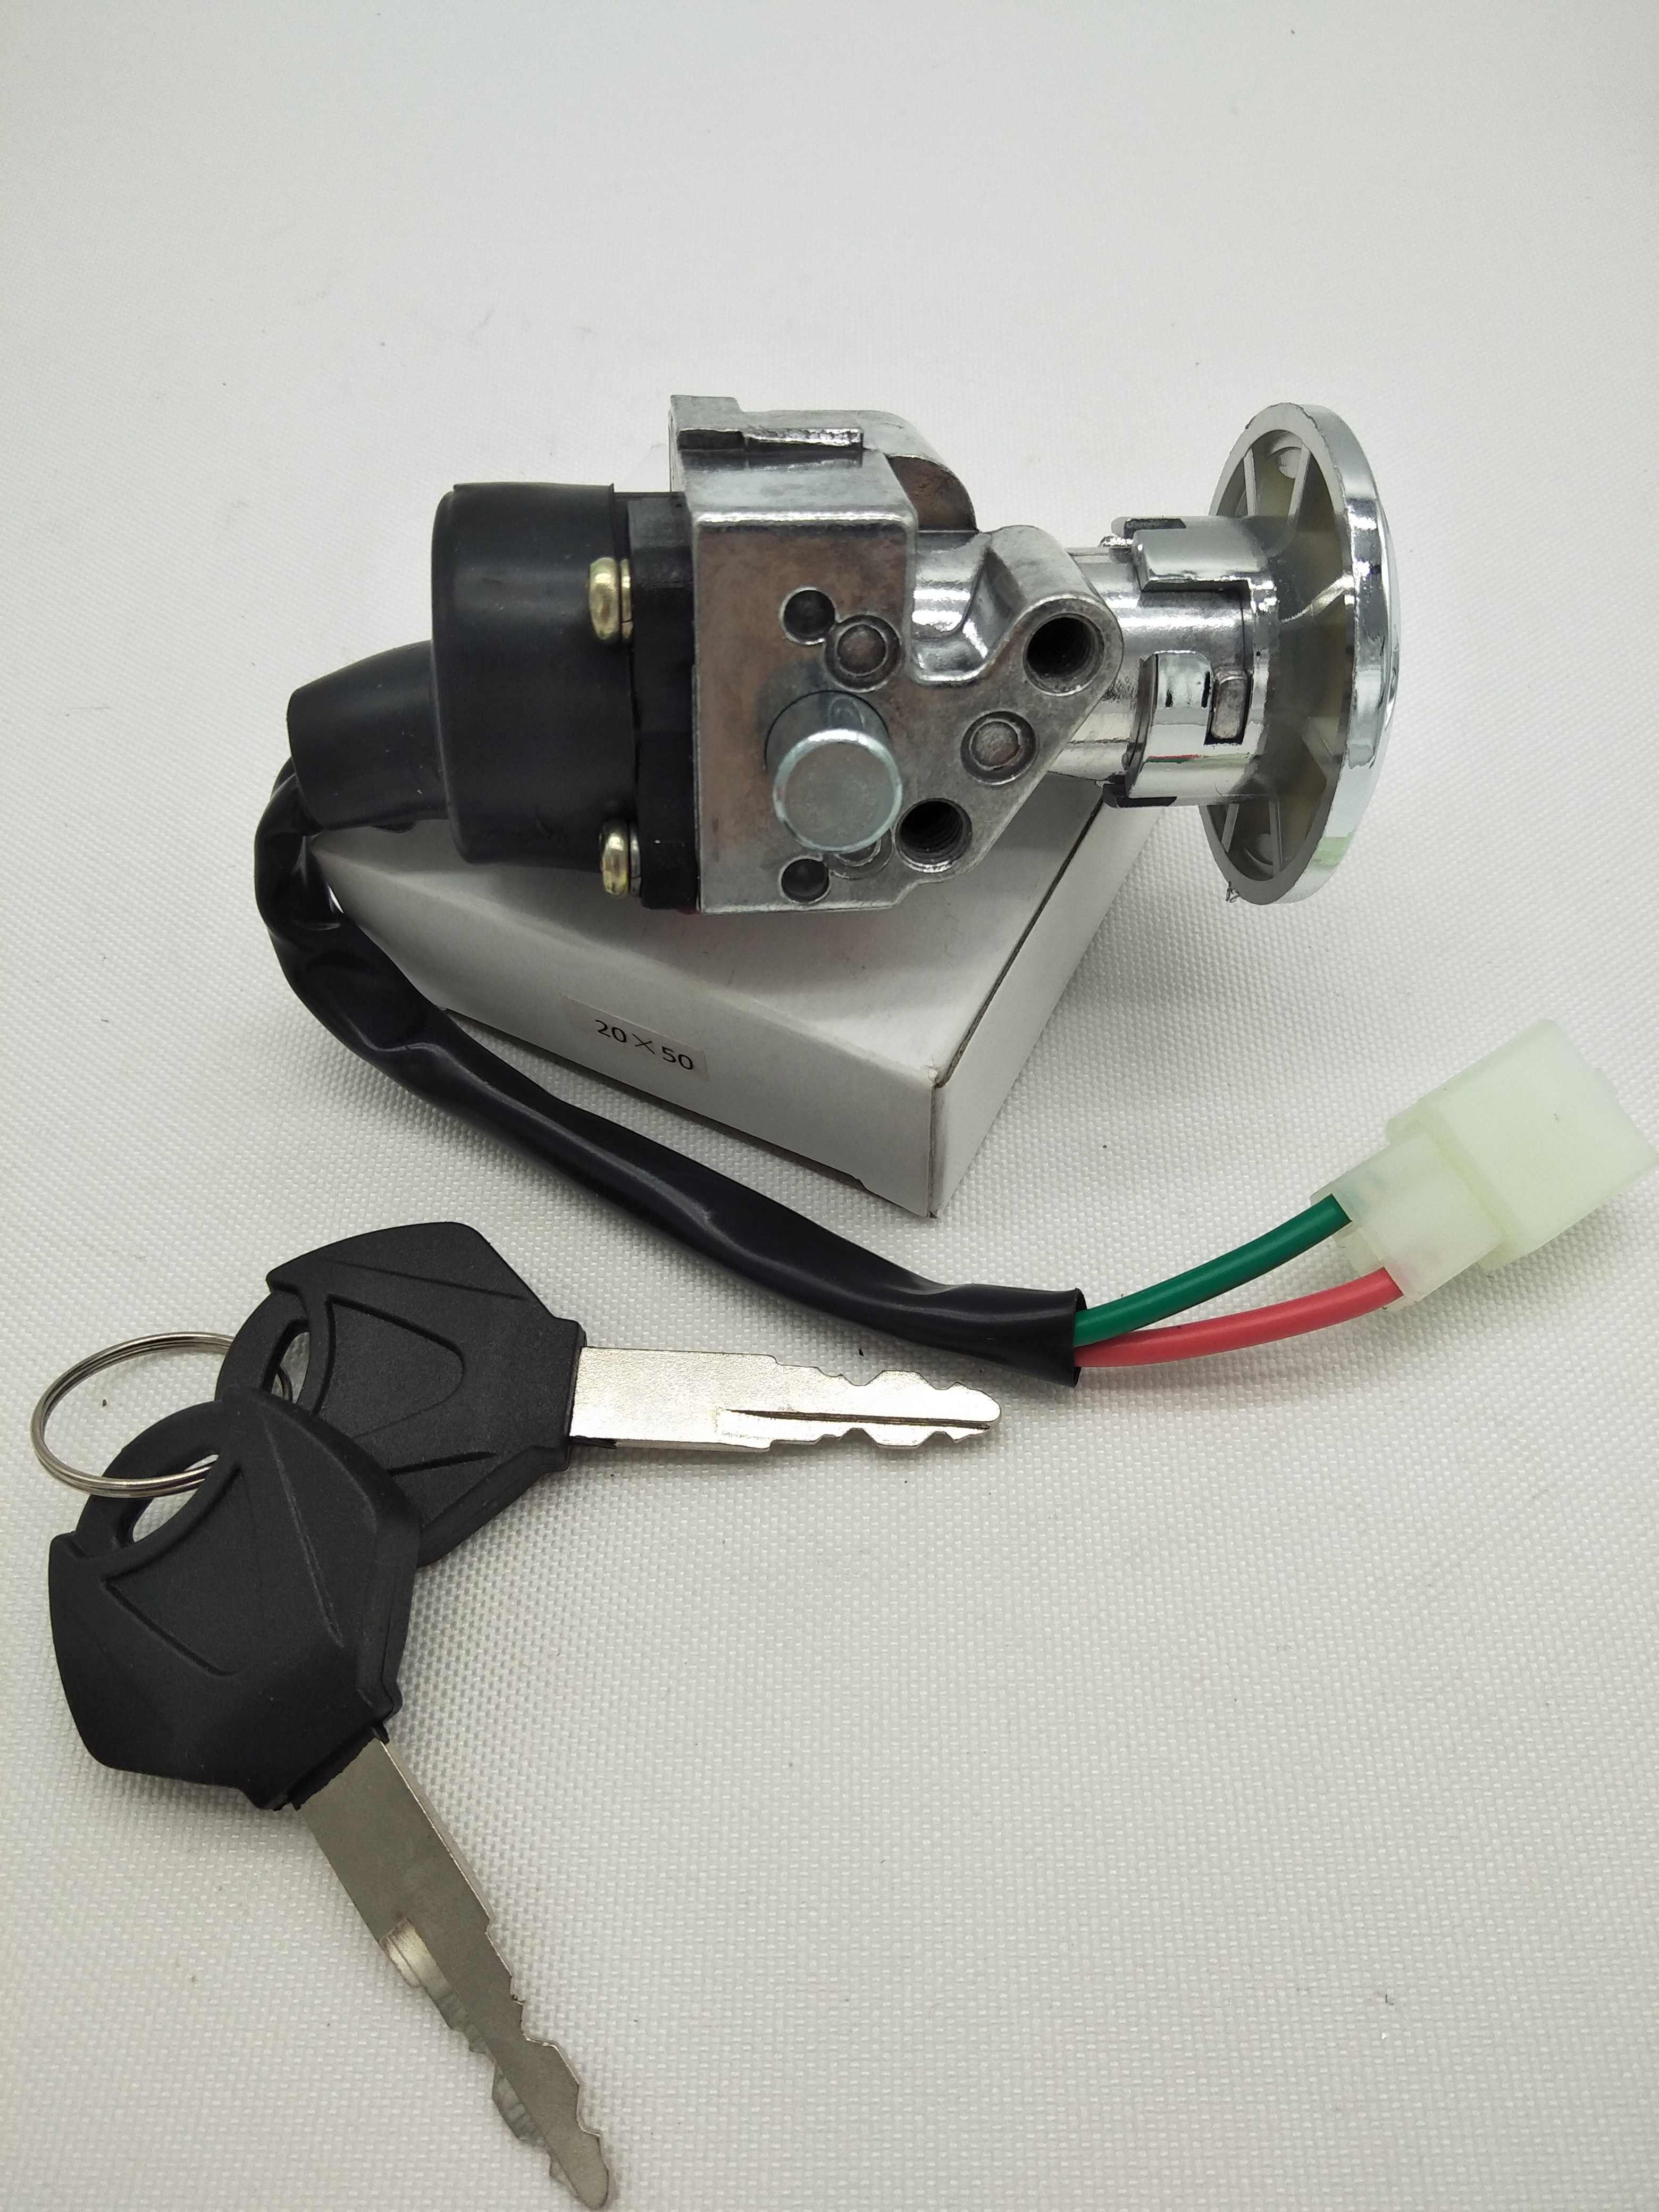 Universal Ignition Switch Wiring : universal, ignition, switch, wiring, Universal, Ignition, Motorcycle, Wires, Honda, Yamaha, Scooter, Switch, Power, Lock Locks, Latches , AliExpress